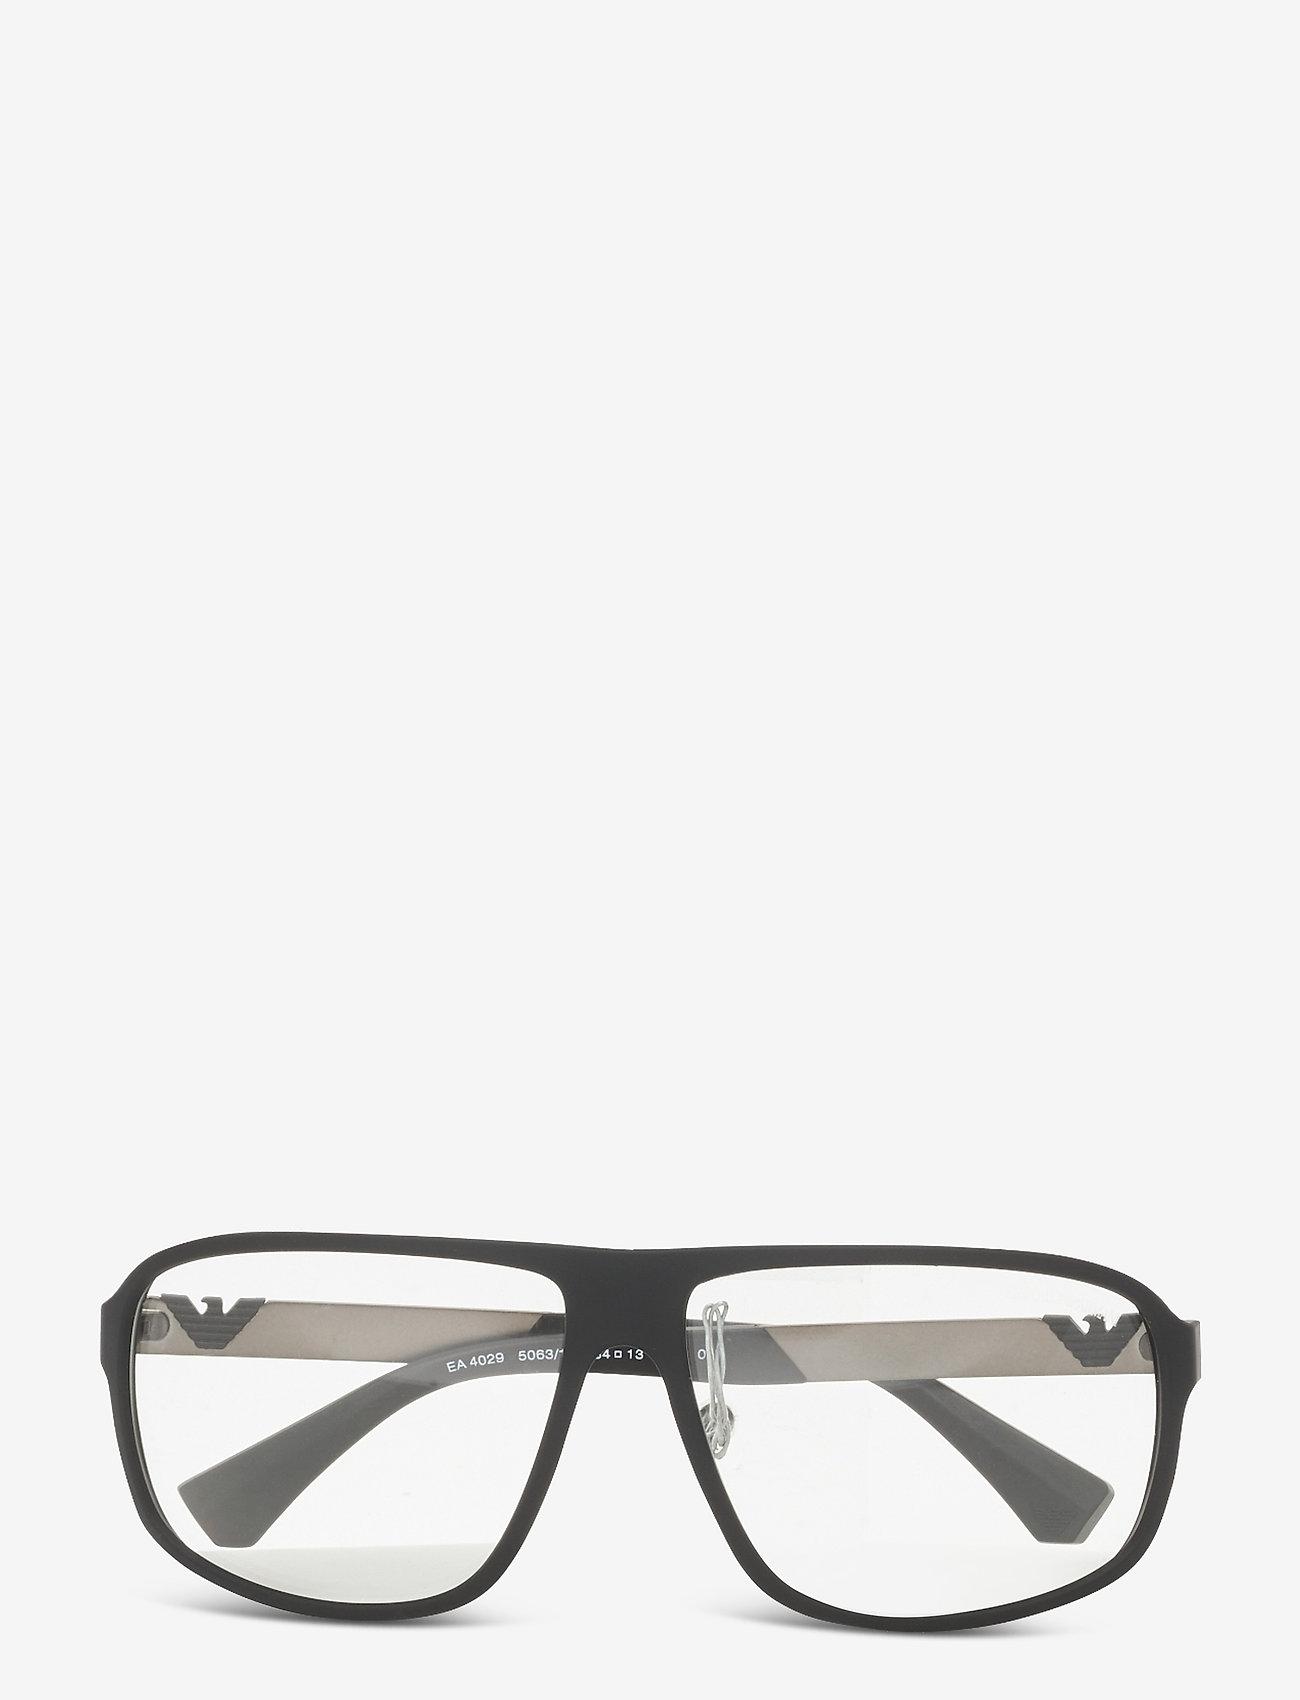 Emporio Armani Sunglasses - Sunglasses - d-shaped - clear - 0